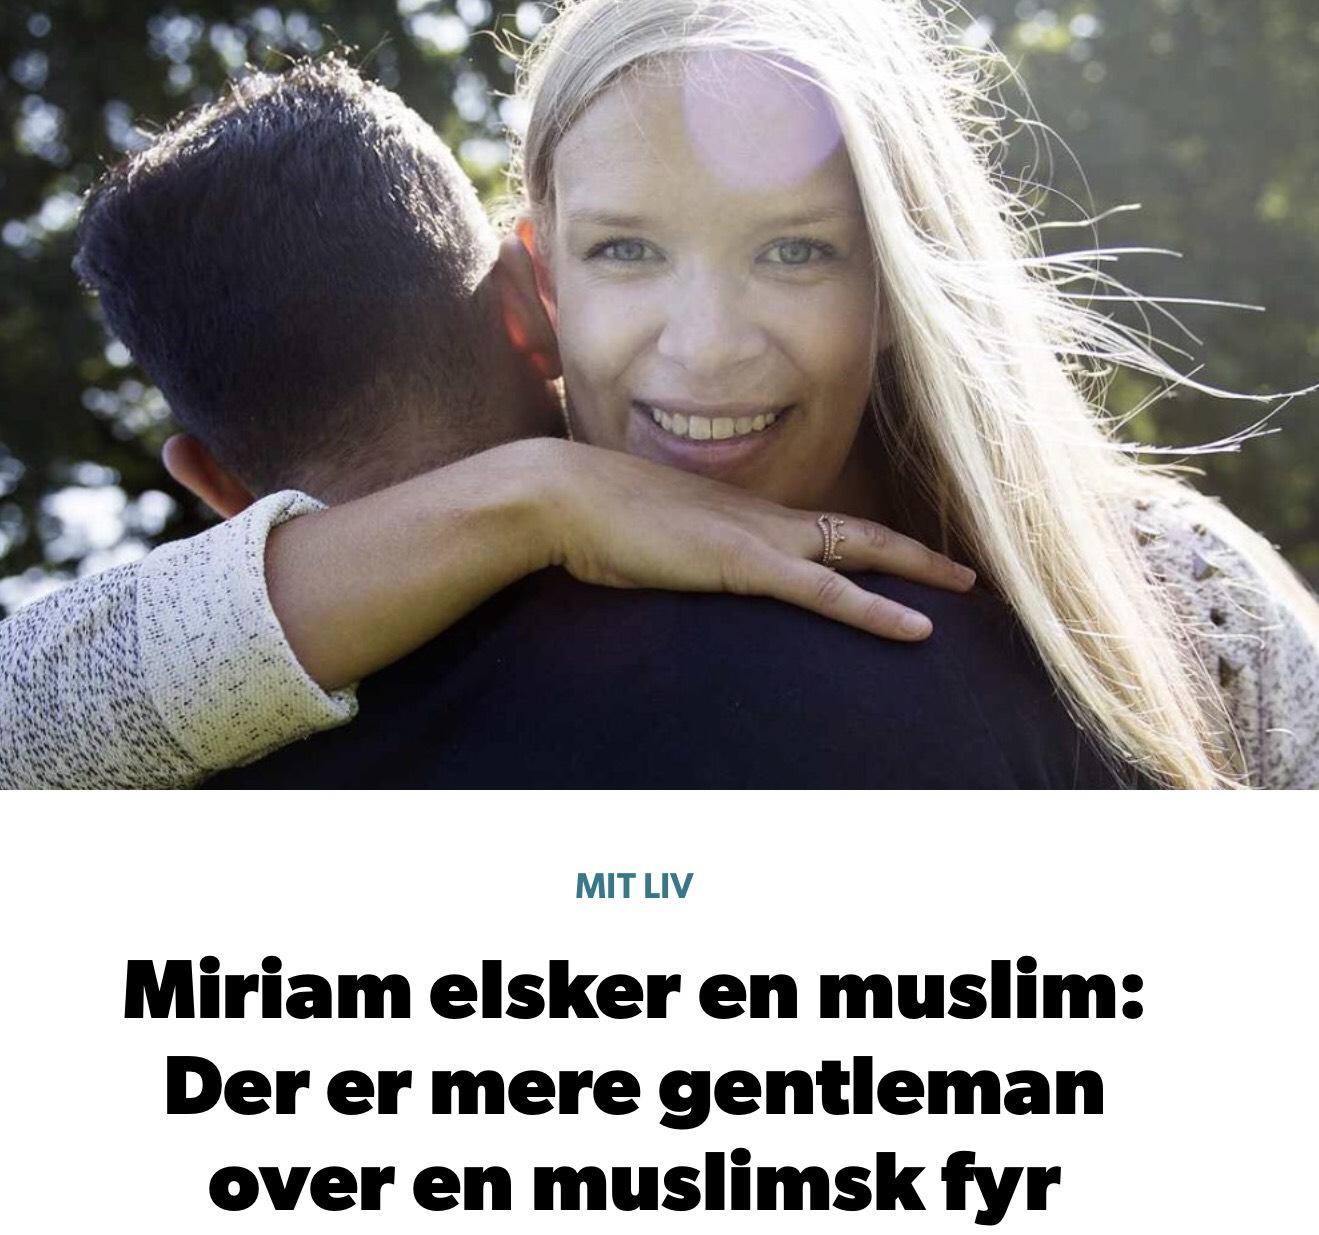 råd om dating en muslim mand grand rapids mi dating